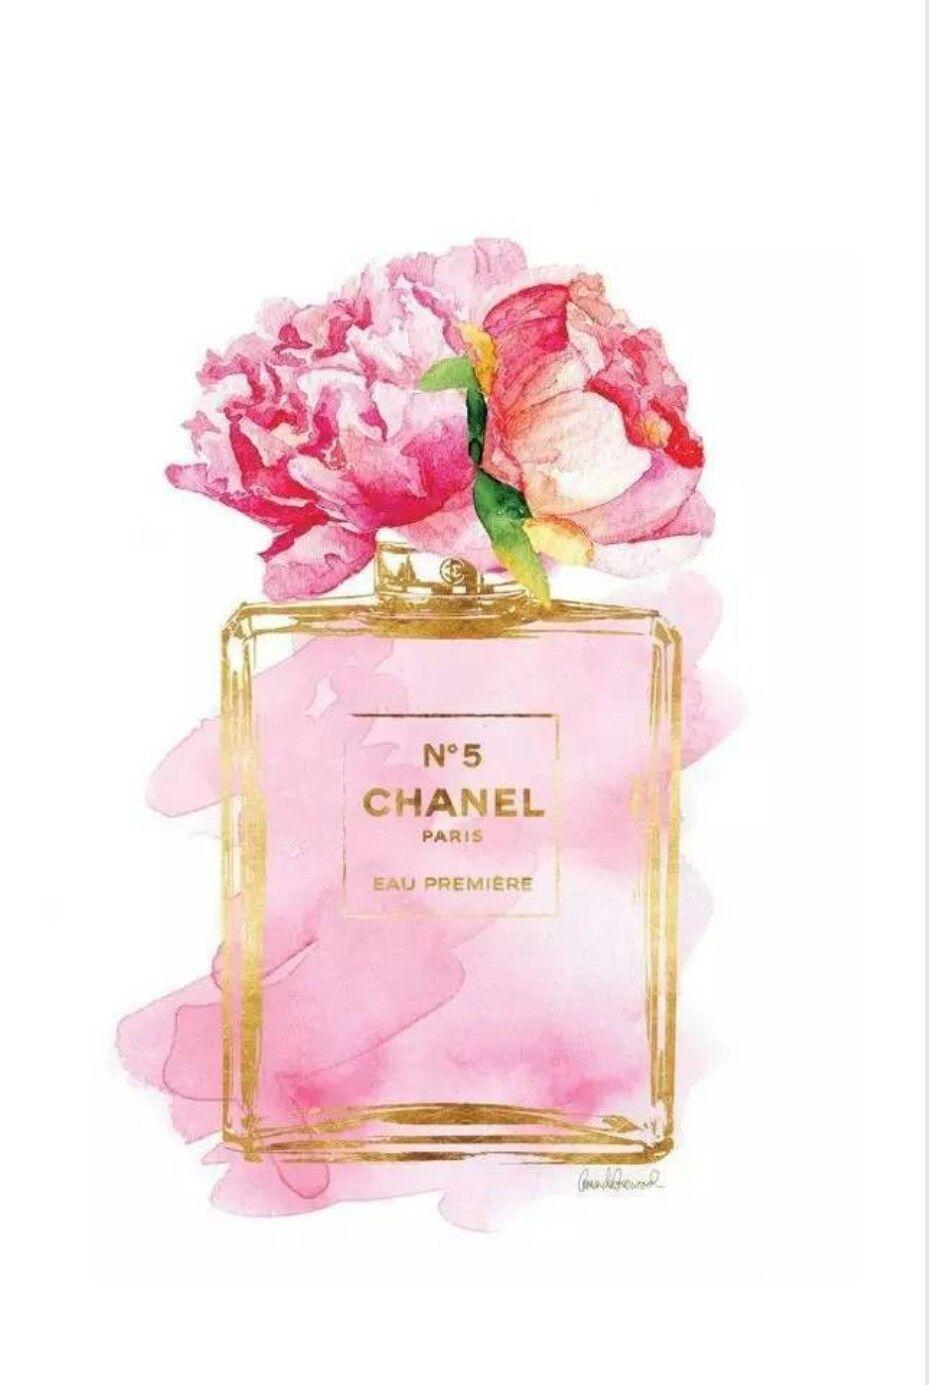 N 5 Channel Chanel アート 香水 イラスト アートポスター